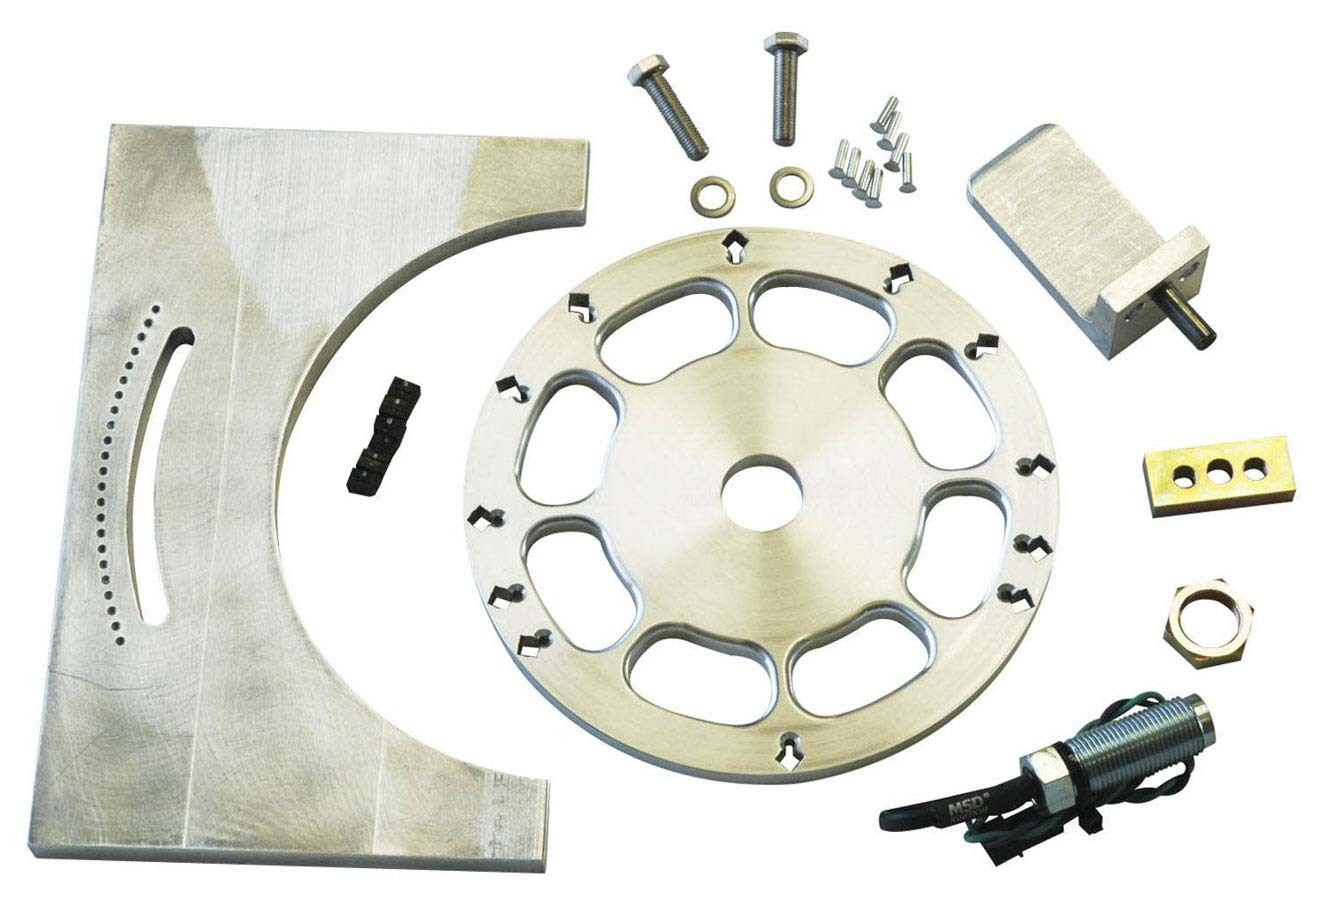 Msd Ignition Universal Crank Trigger Kit